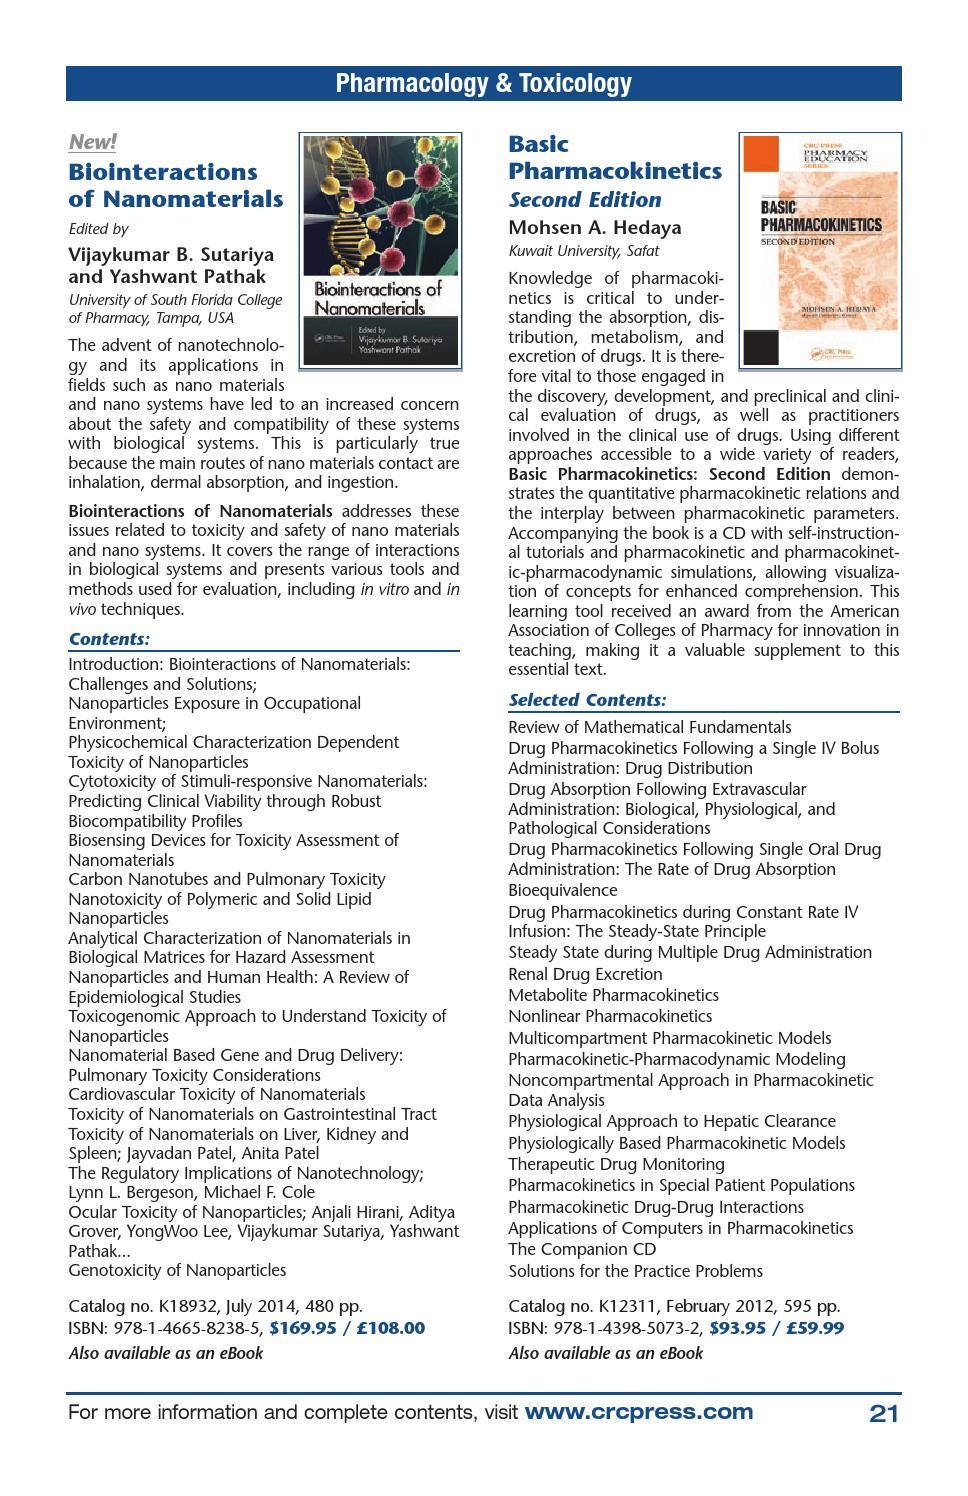 Basic Pharmacokinetics - Mohsen A. Hedaya - Google Books